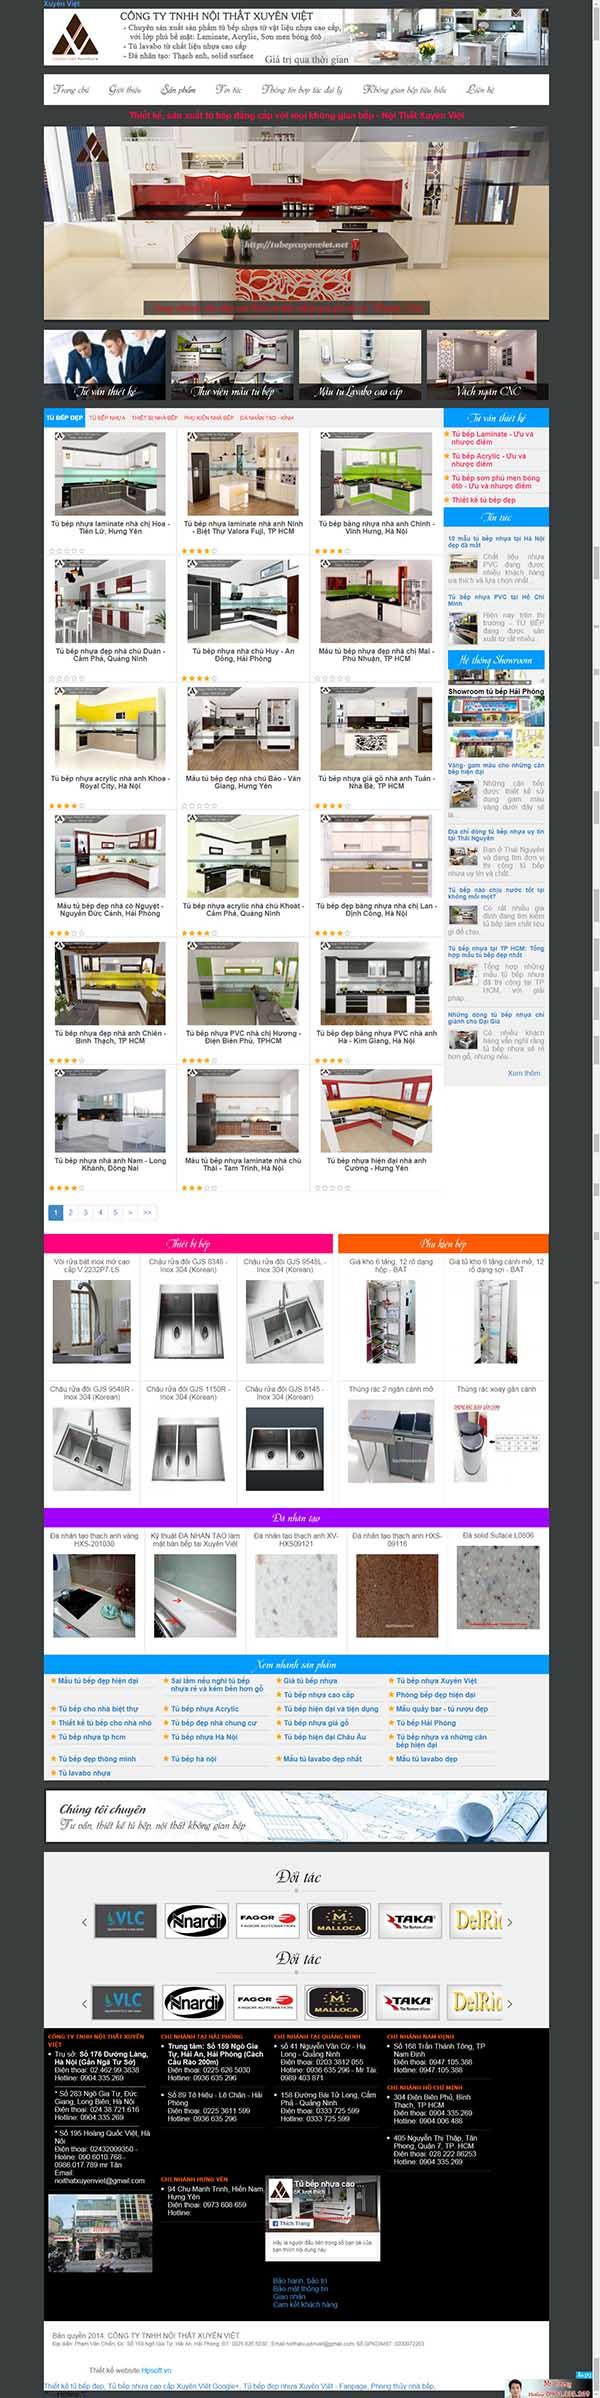 Thiết kế Mẫu website tủ bếp 02